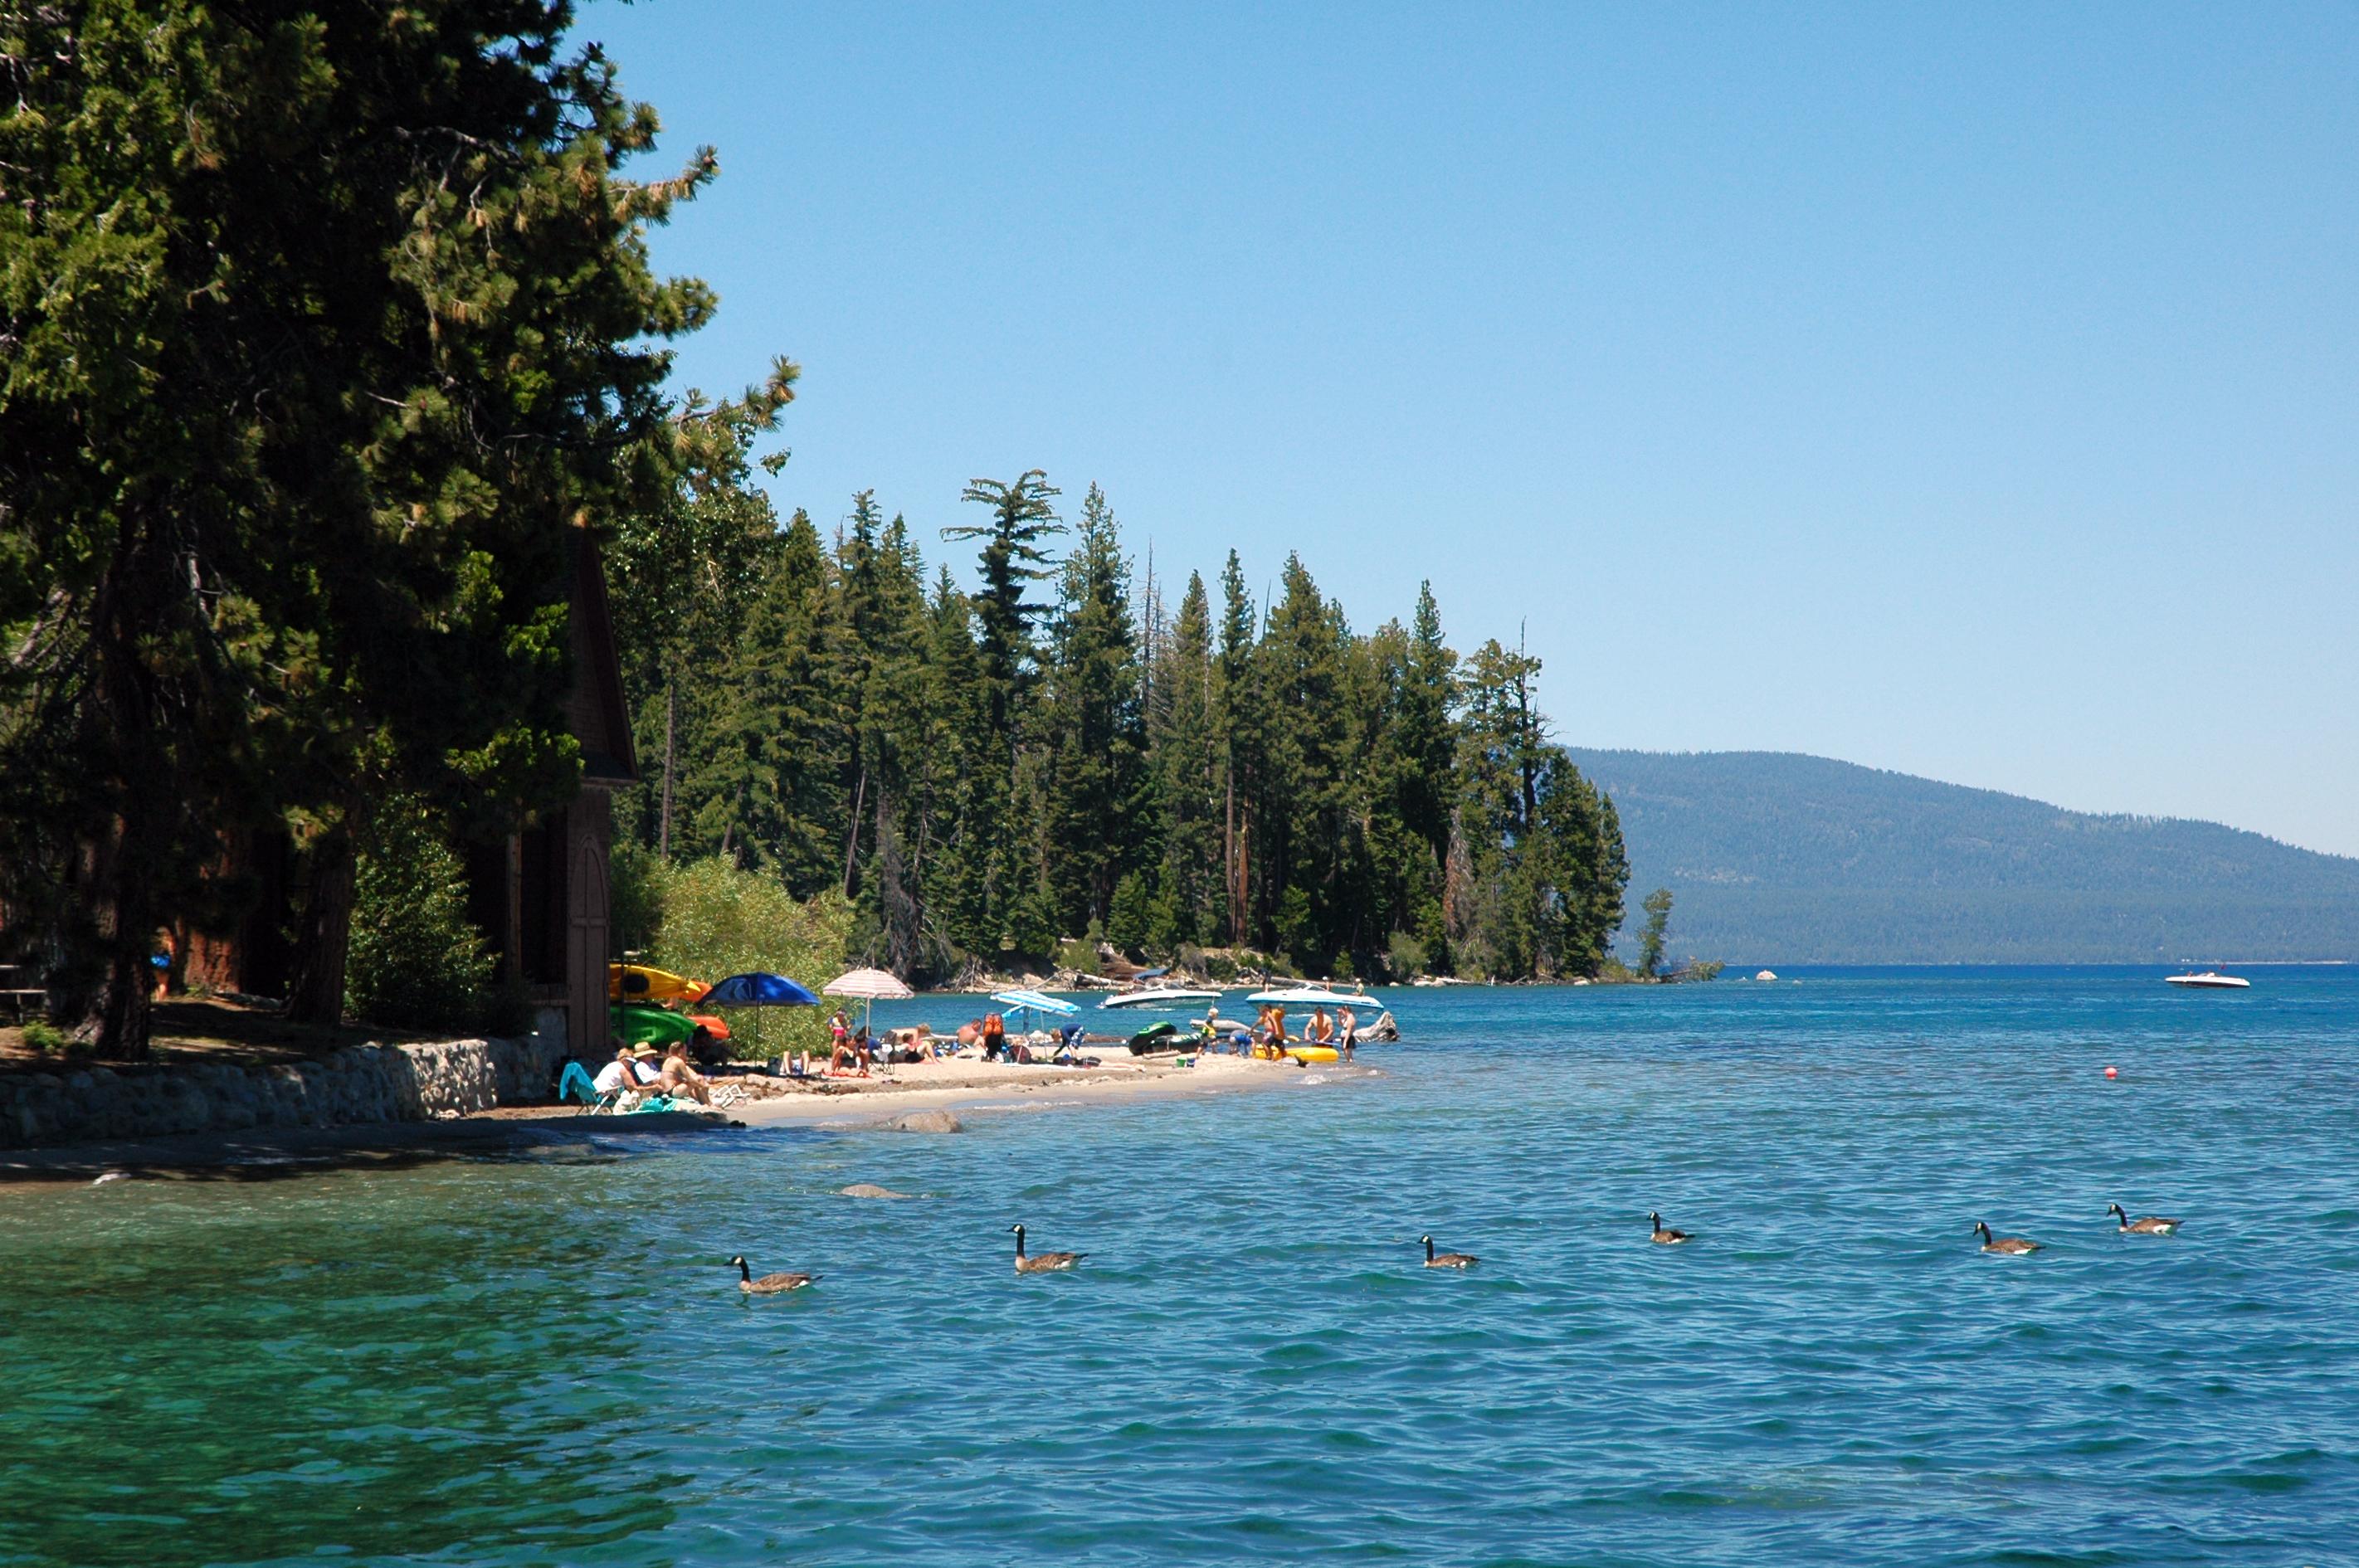 Pine Island Resort Canada